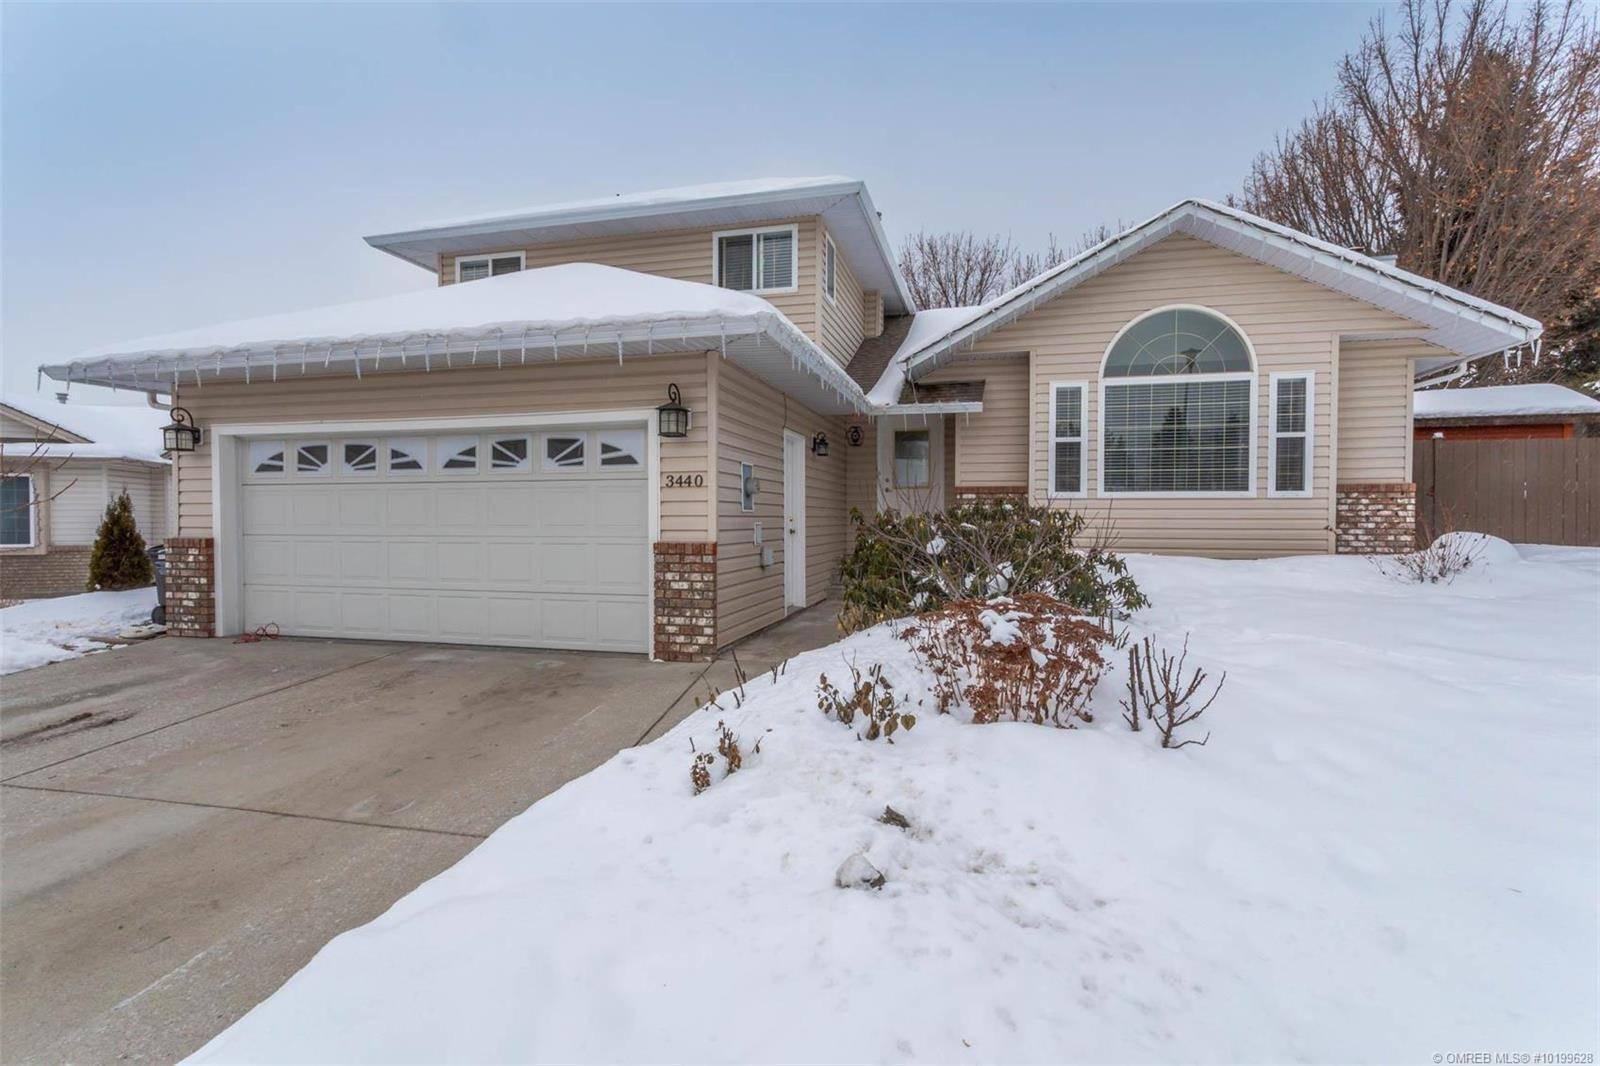 House for sale at 3440 Rosedale Pl West Kelowna British Columbia - MLS: 10199628